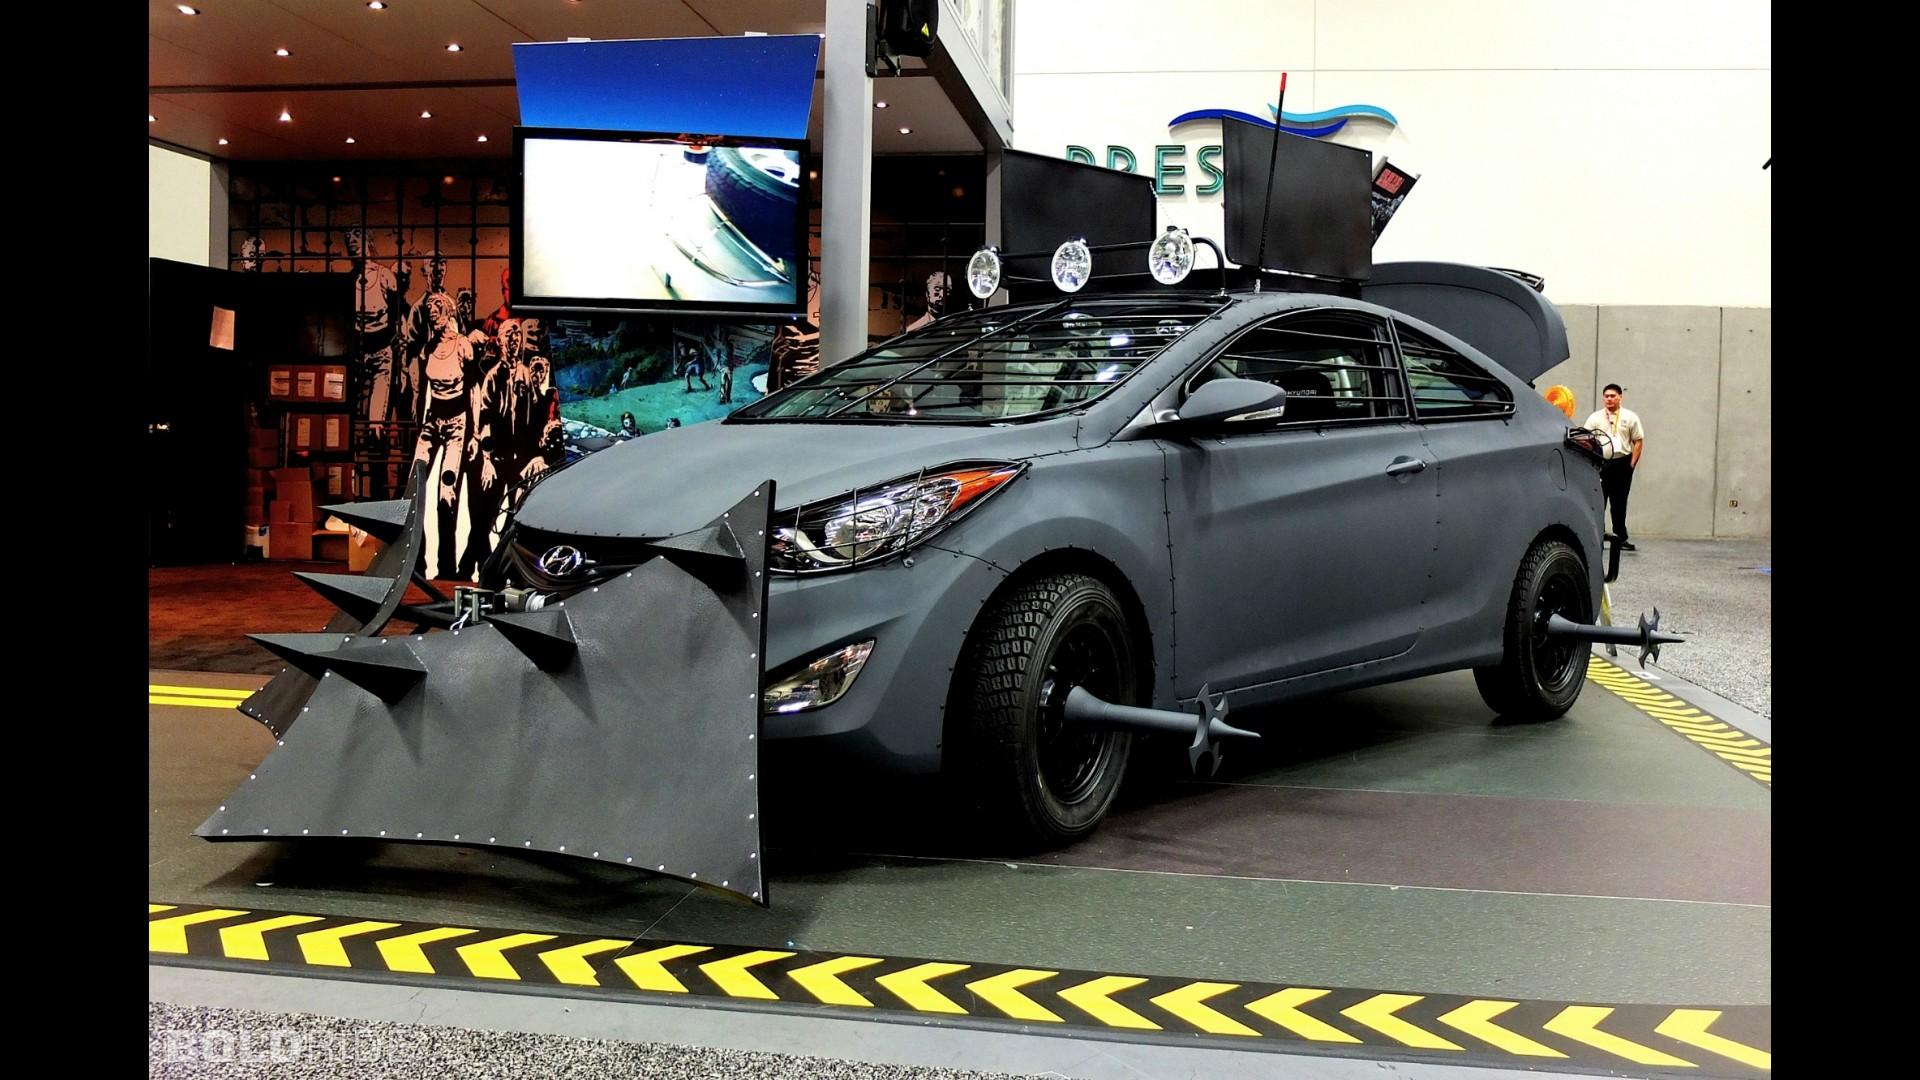 Hyundai Elantra Coupe Zombie Survival Machine